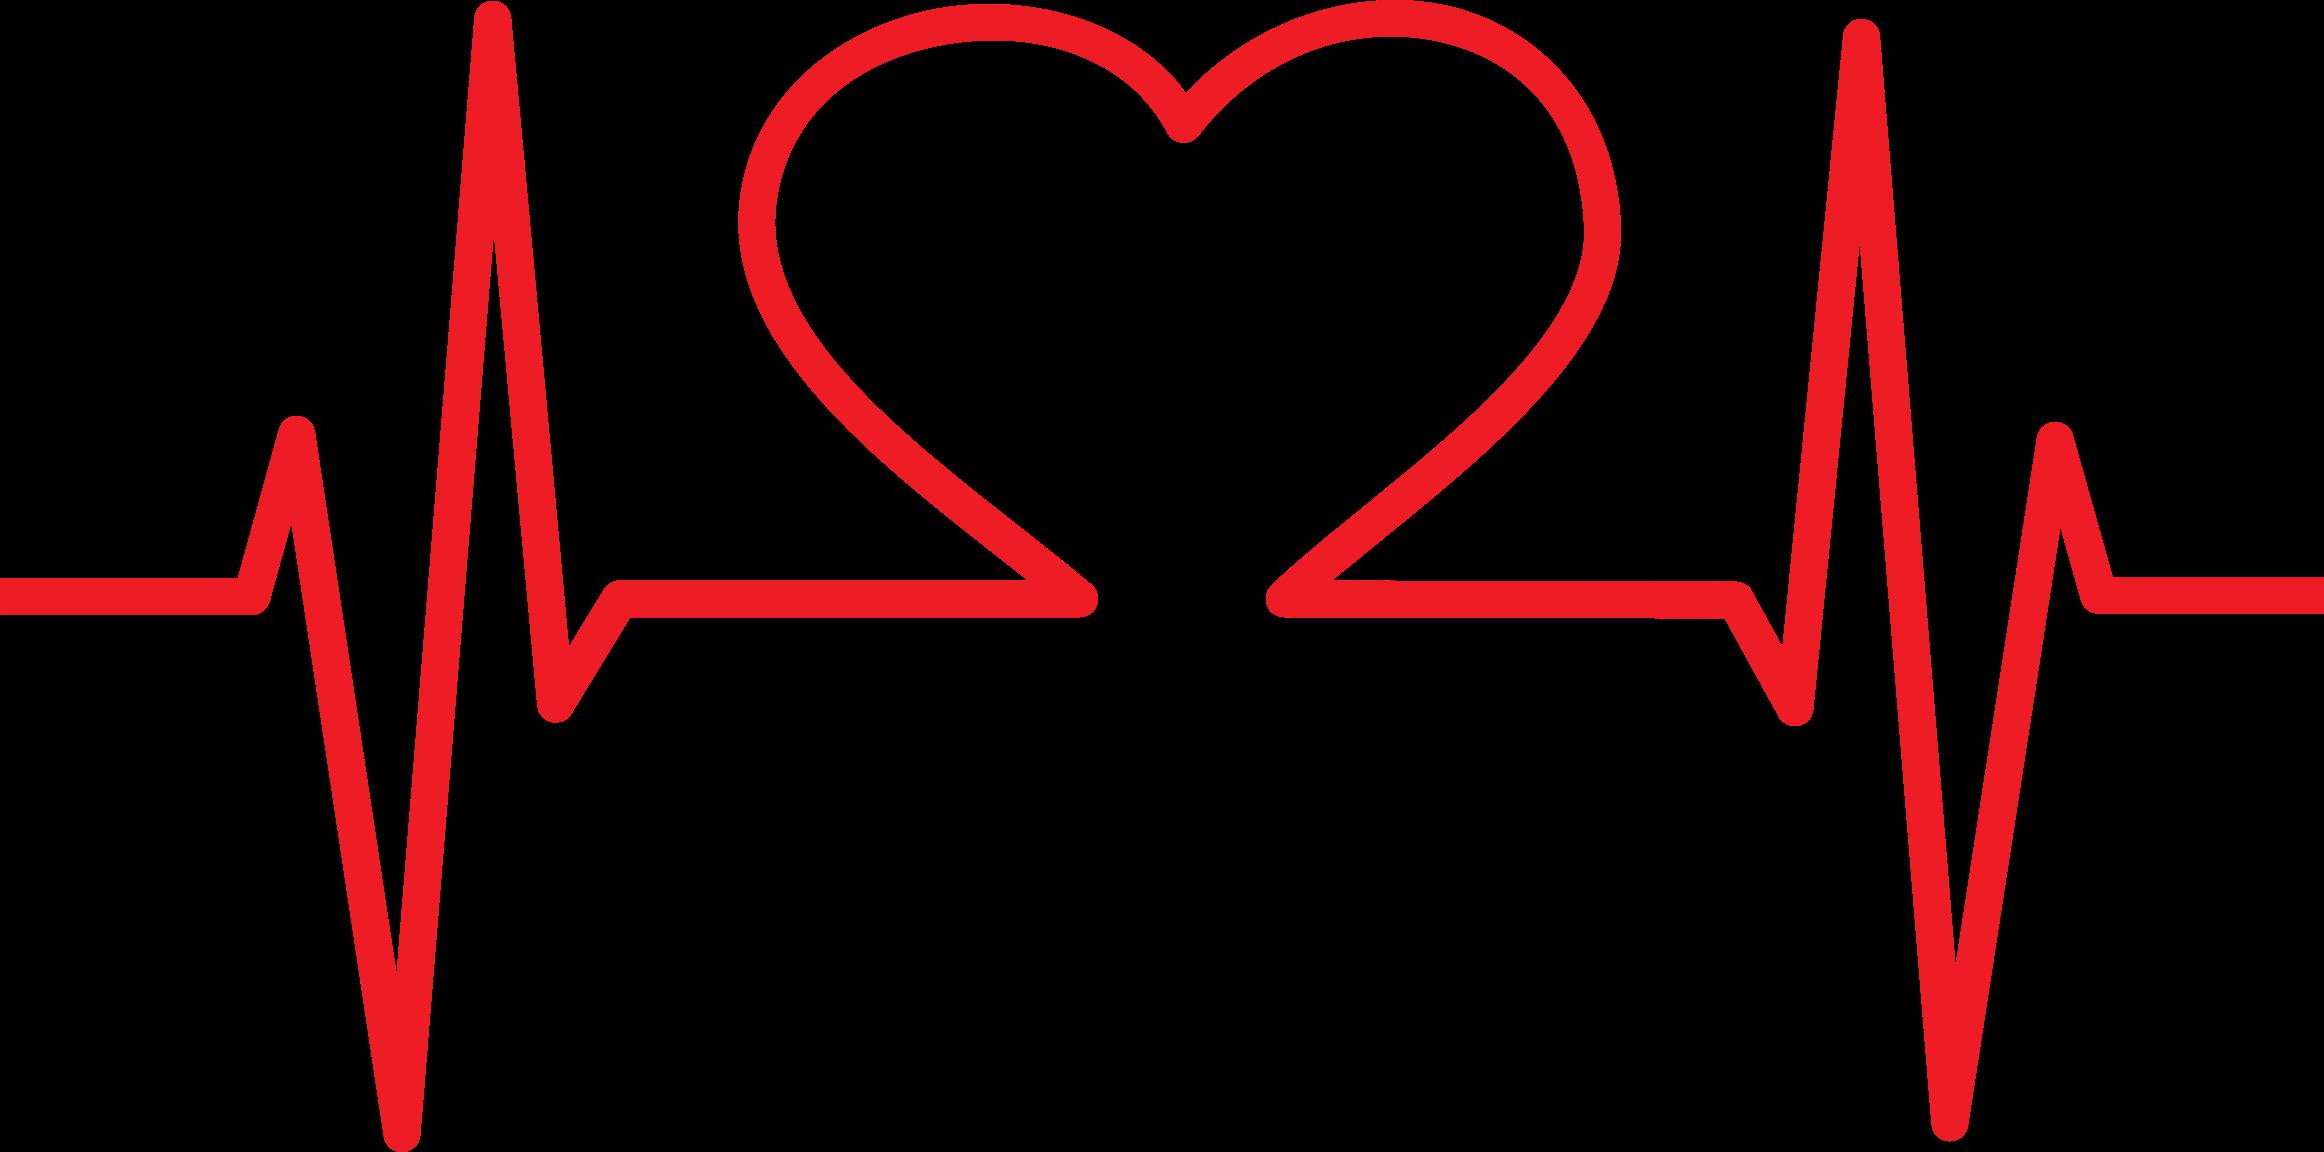 Heart ekg big image. Heartbeat clipart transparent